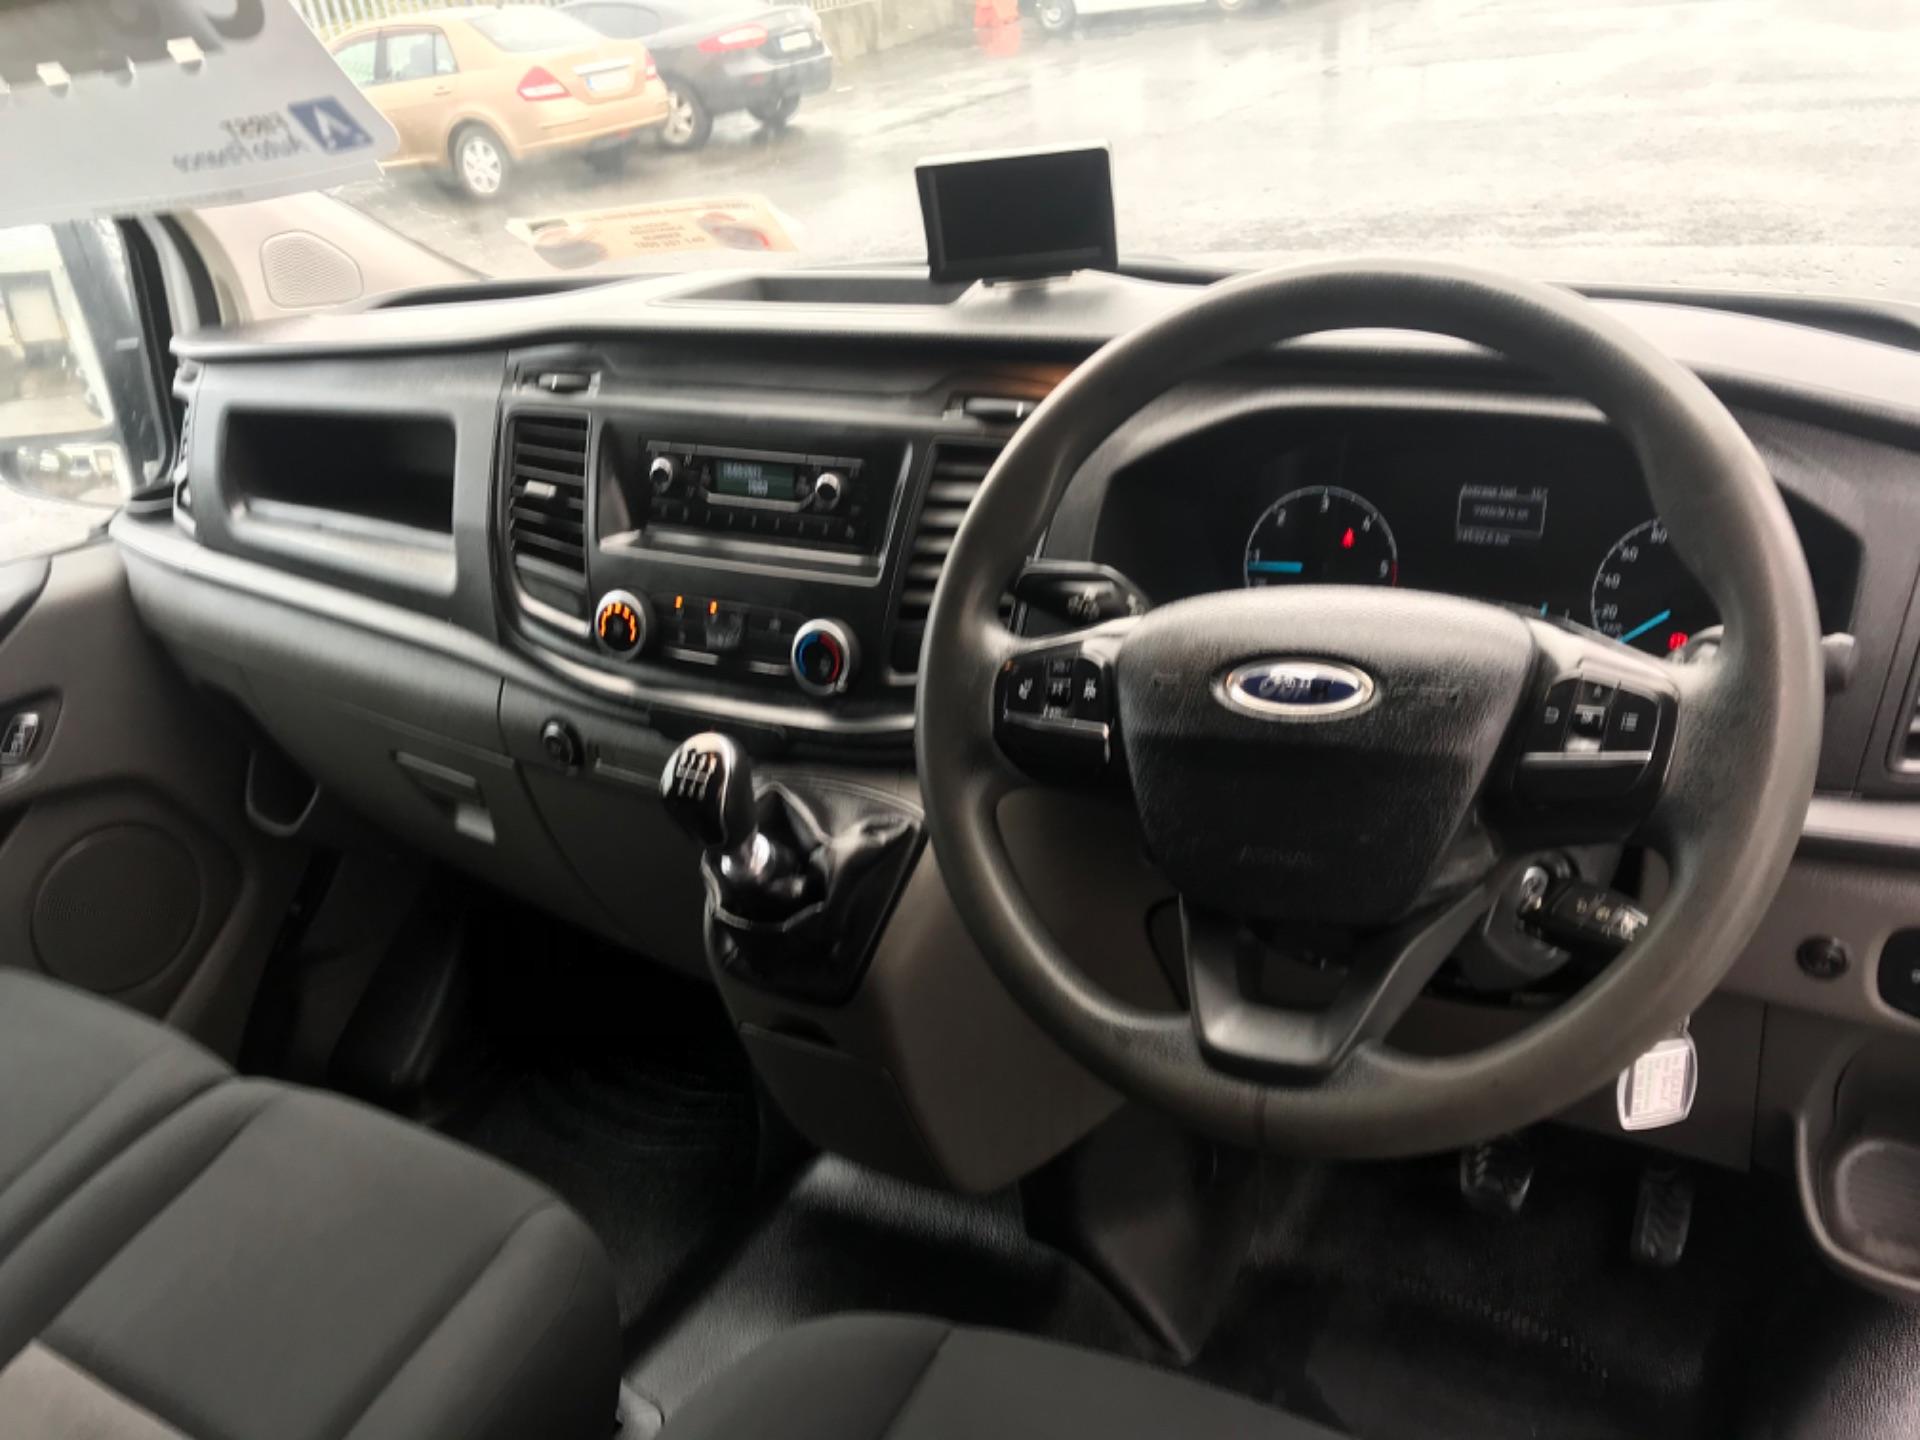 2018 Ford Transit Custom Custom 300 Lbase 2.0 105PS 3DR (181D27029) Image 15